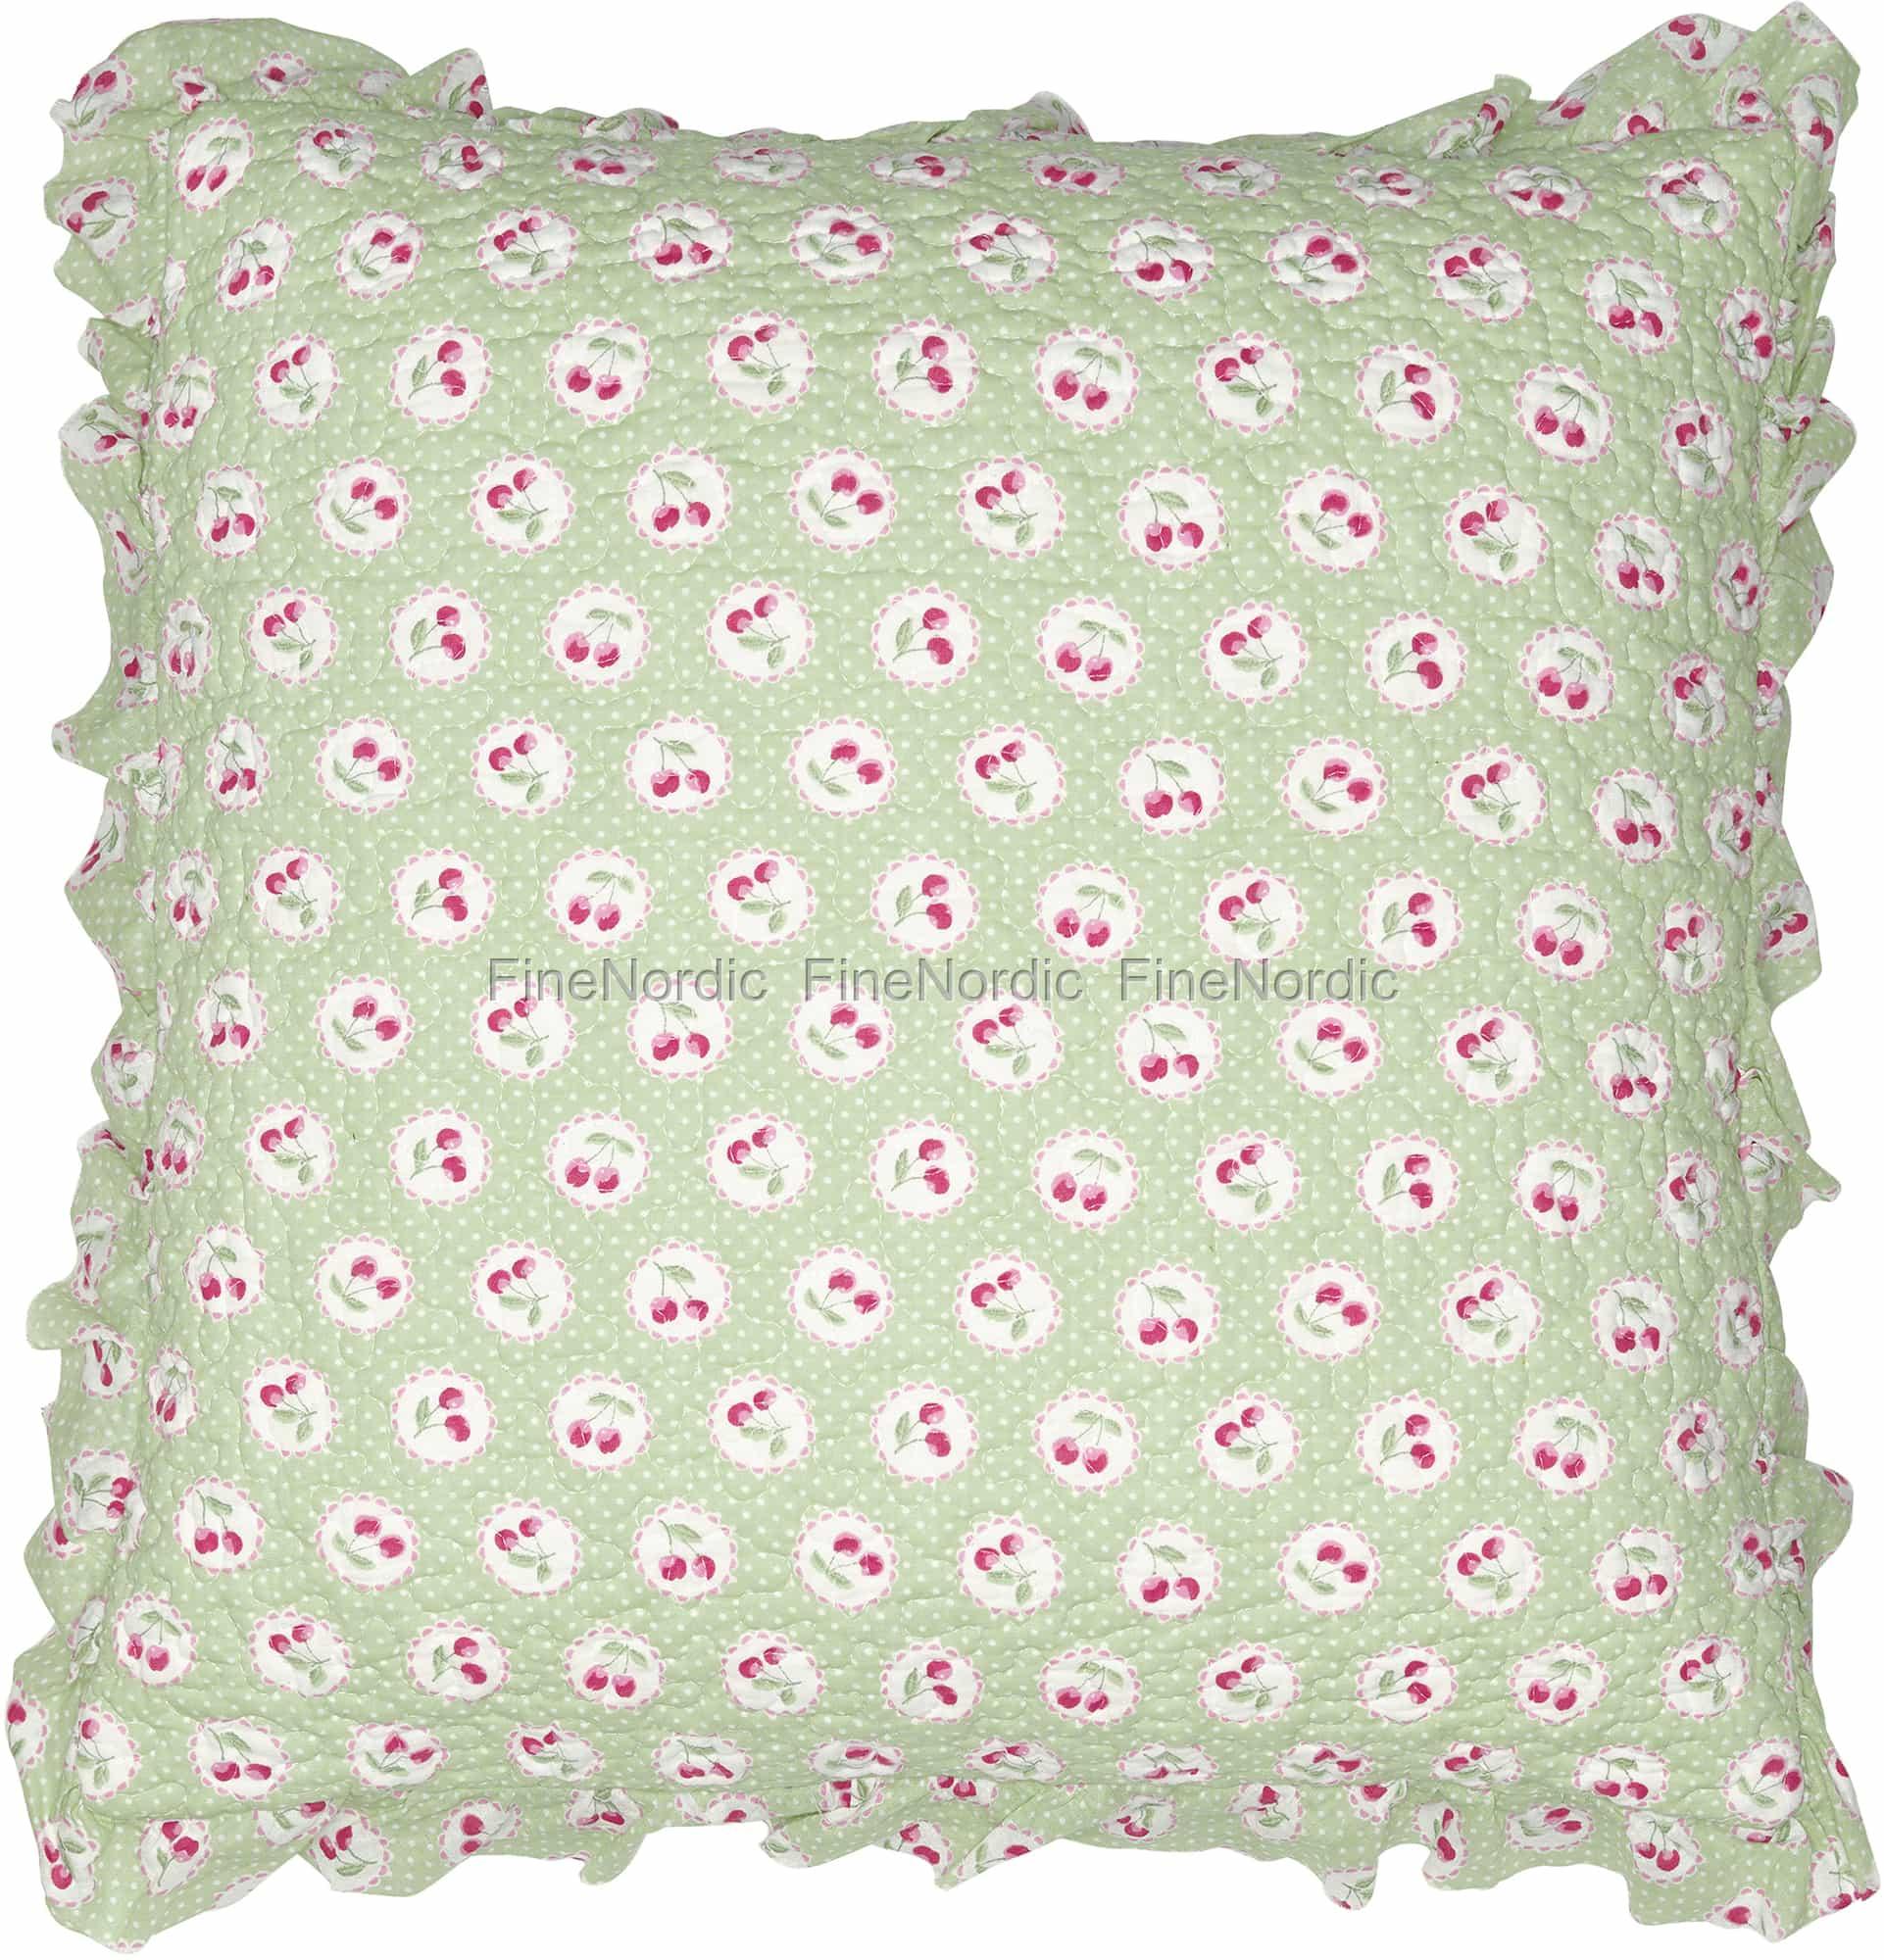 greengate kissenh lle cherry berry pale green r schen 50 x 50 cm. Black Bedroom Furniture Sets. Home Design Ideas